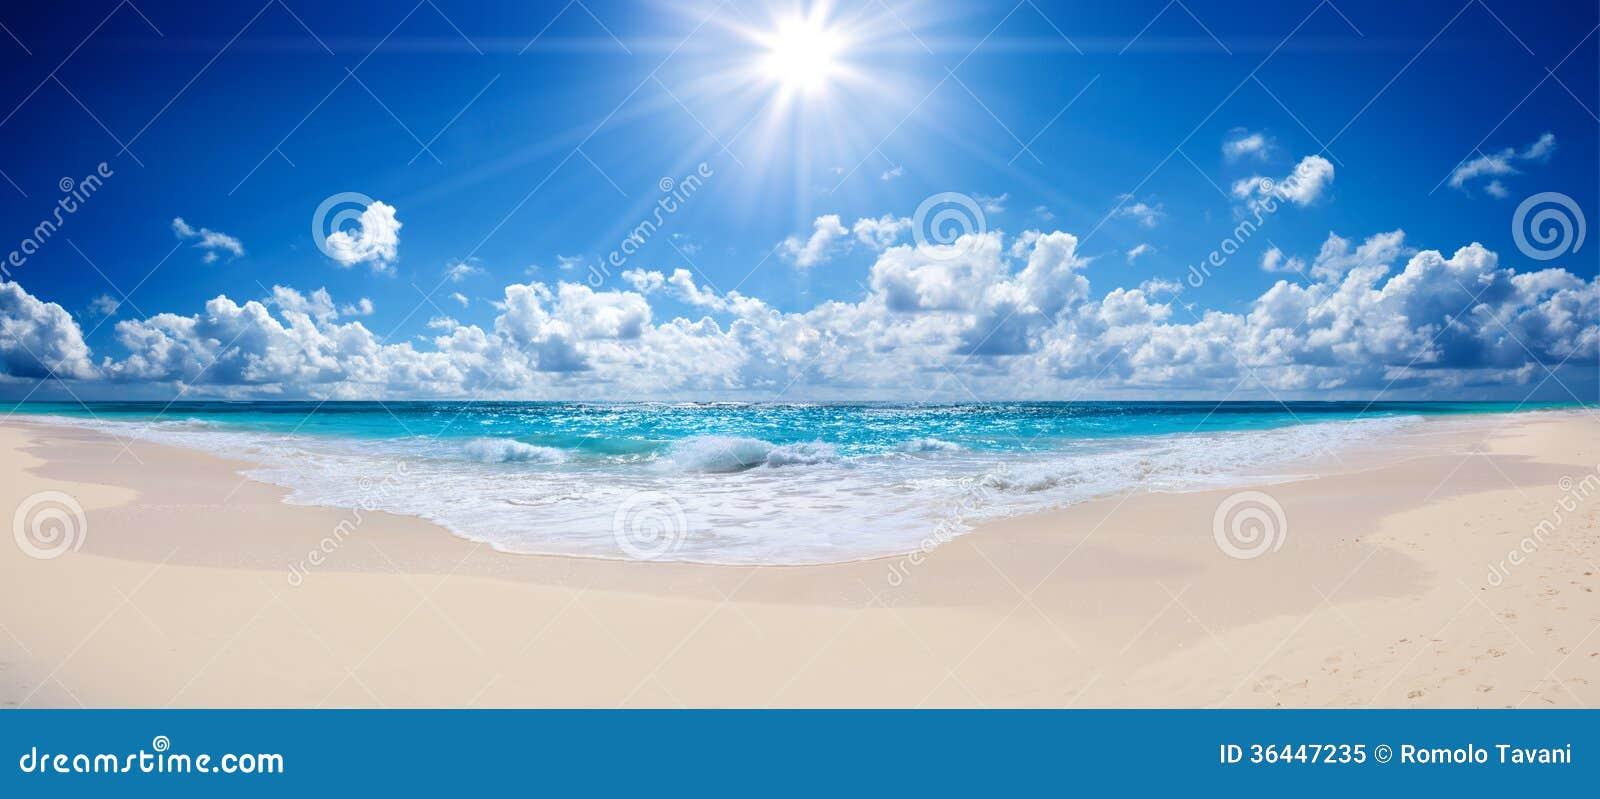 Playa y mar tropicales